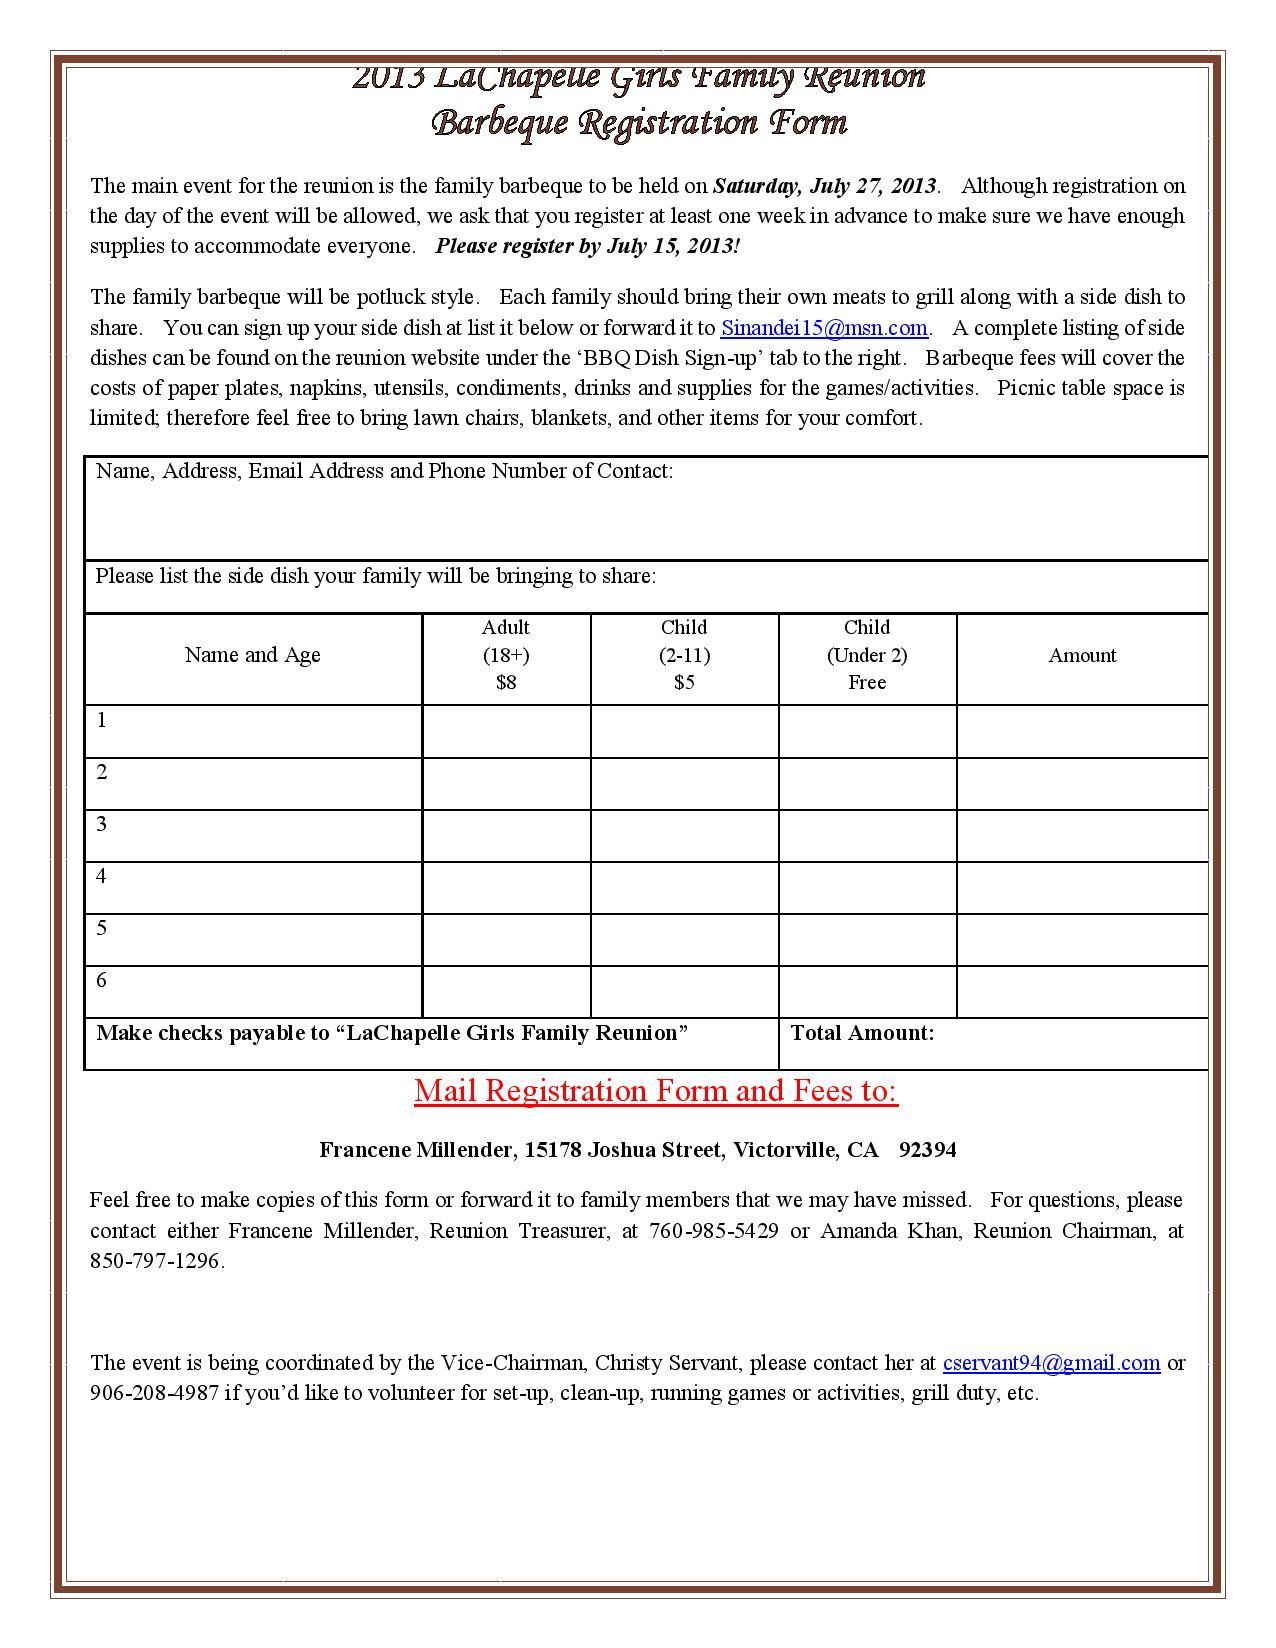 Registrations Forms For Family Reunion Family Reunion Registration